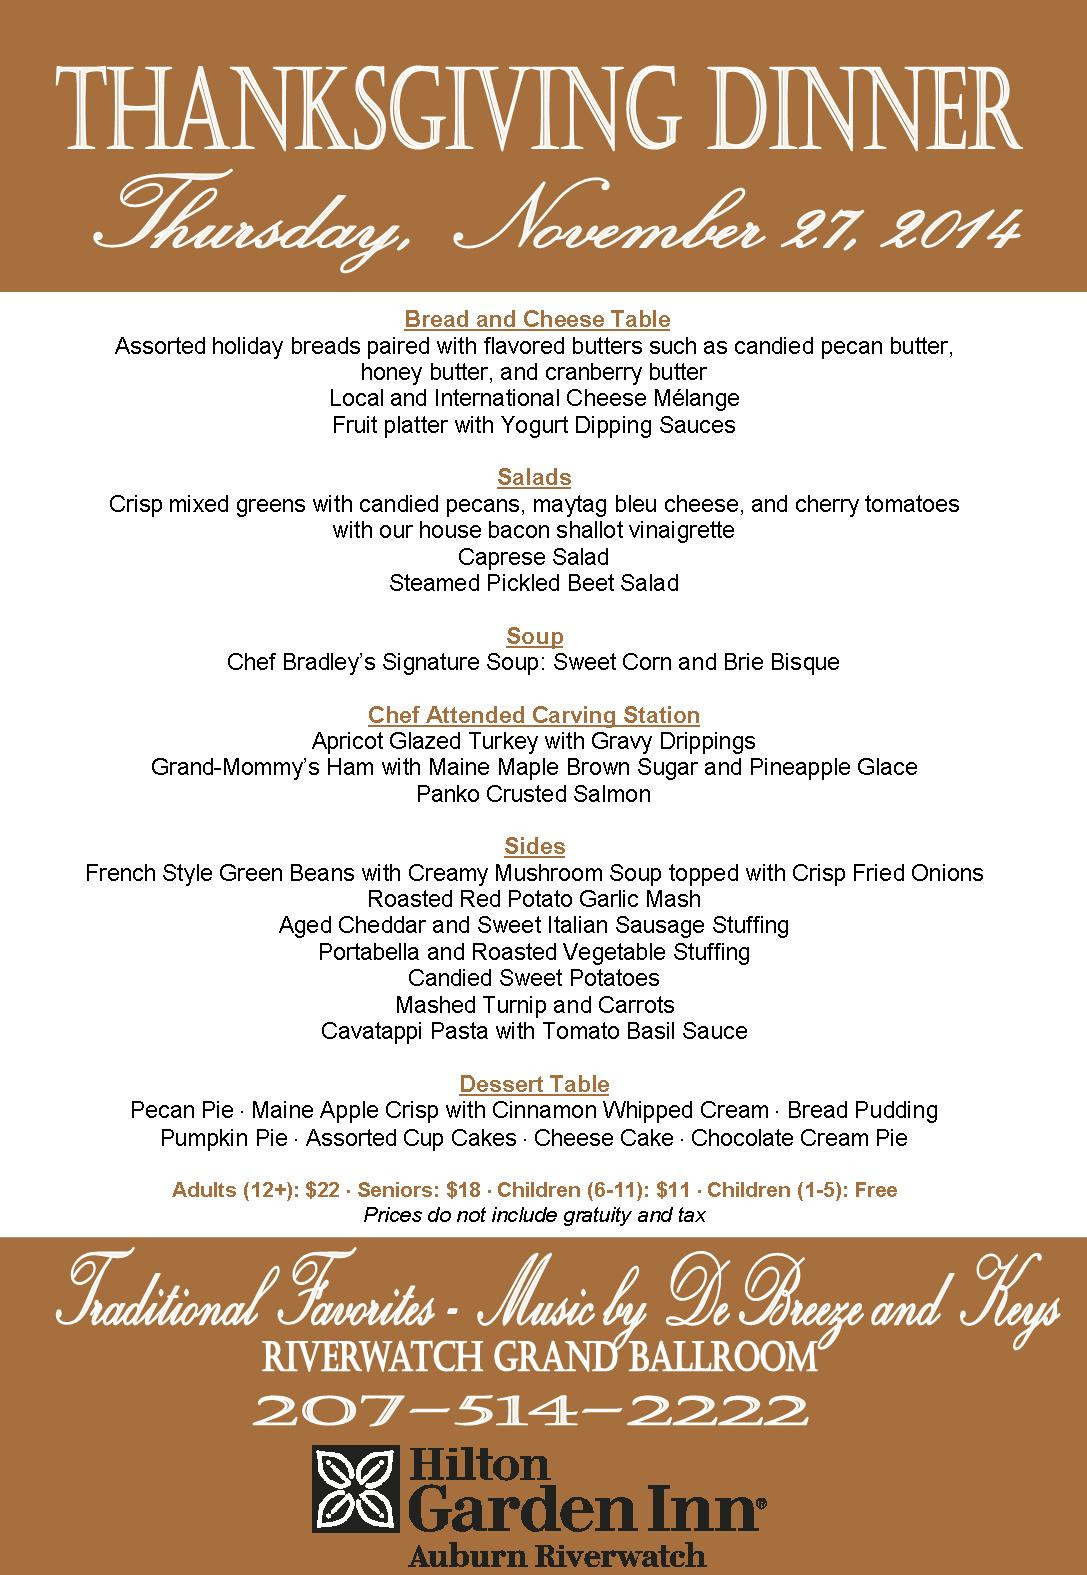 Traditional Thanksgiving Dinner Menu List  Top 28 Typical Thanksgiving Menu serving thanksgiving